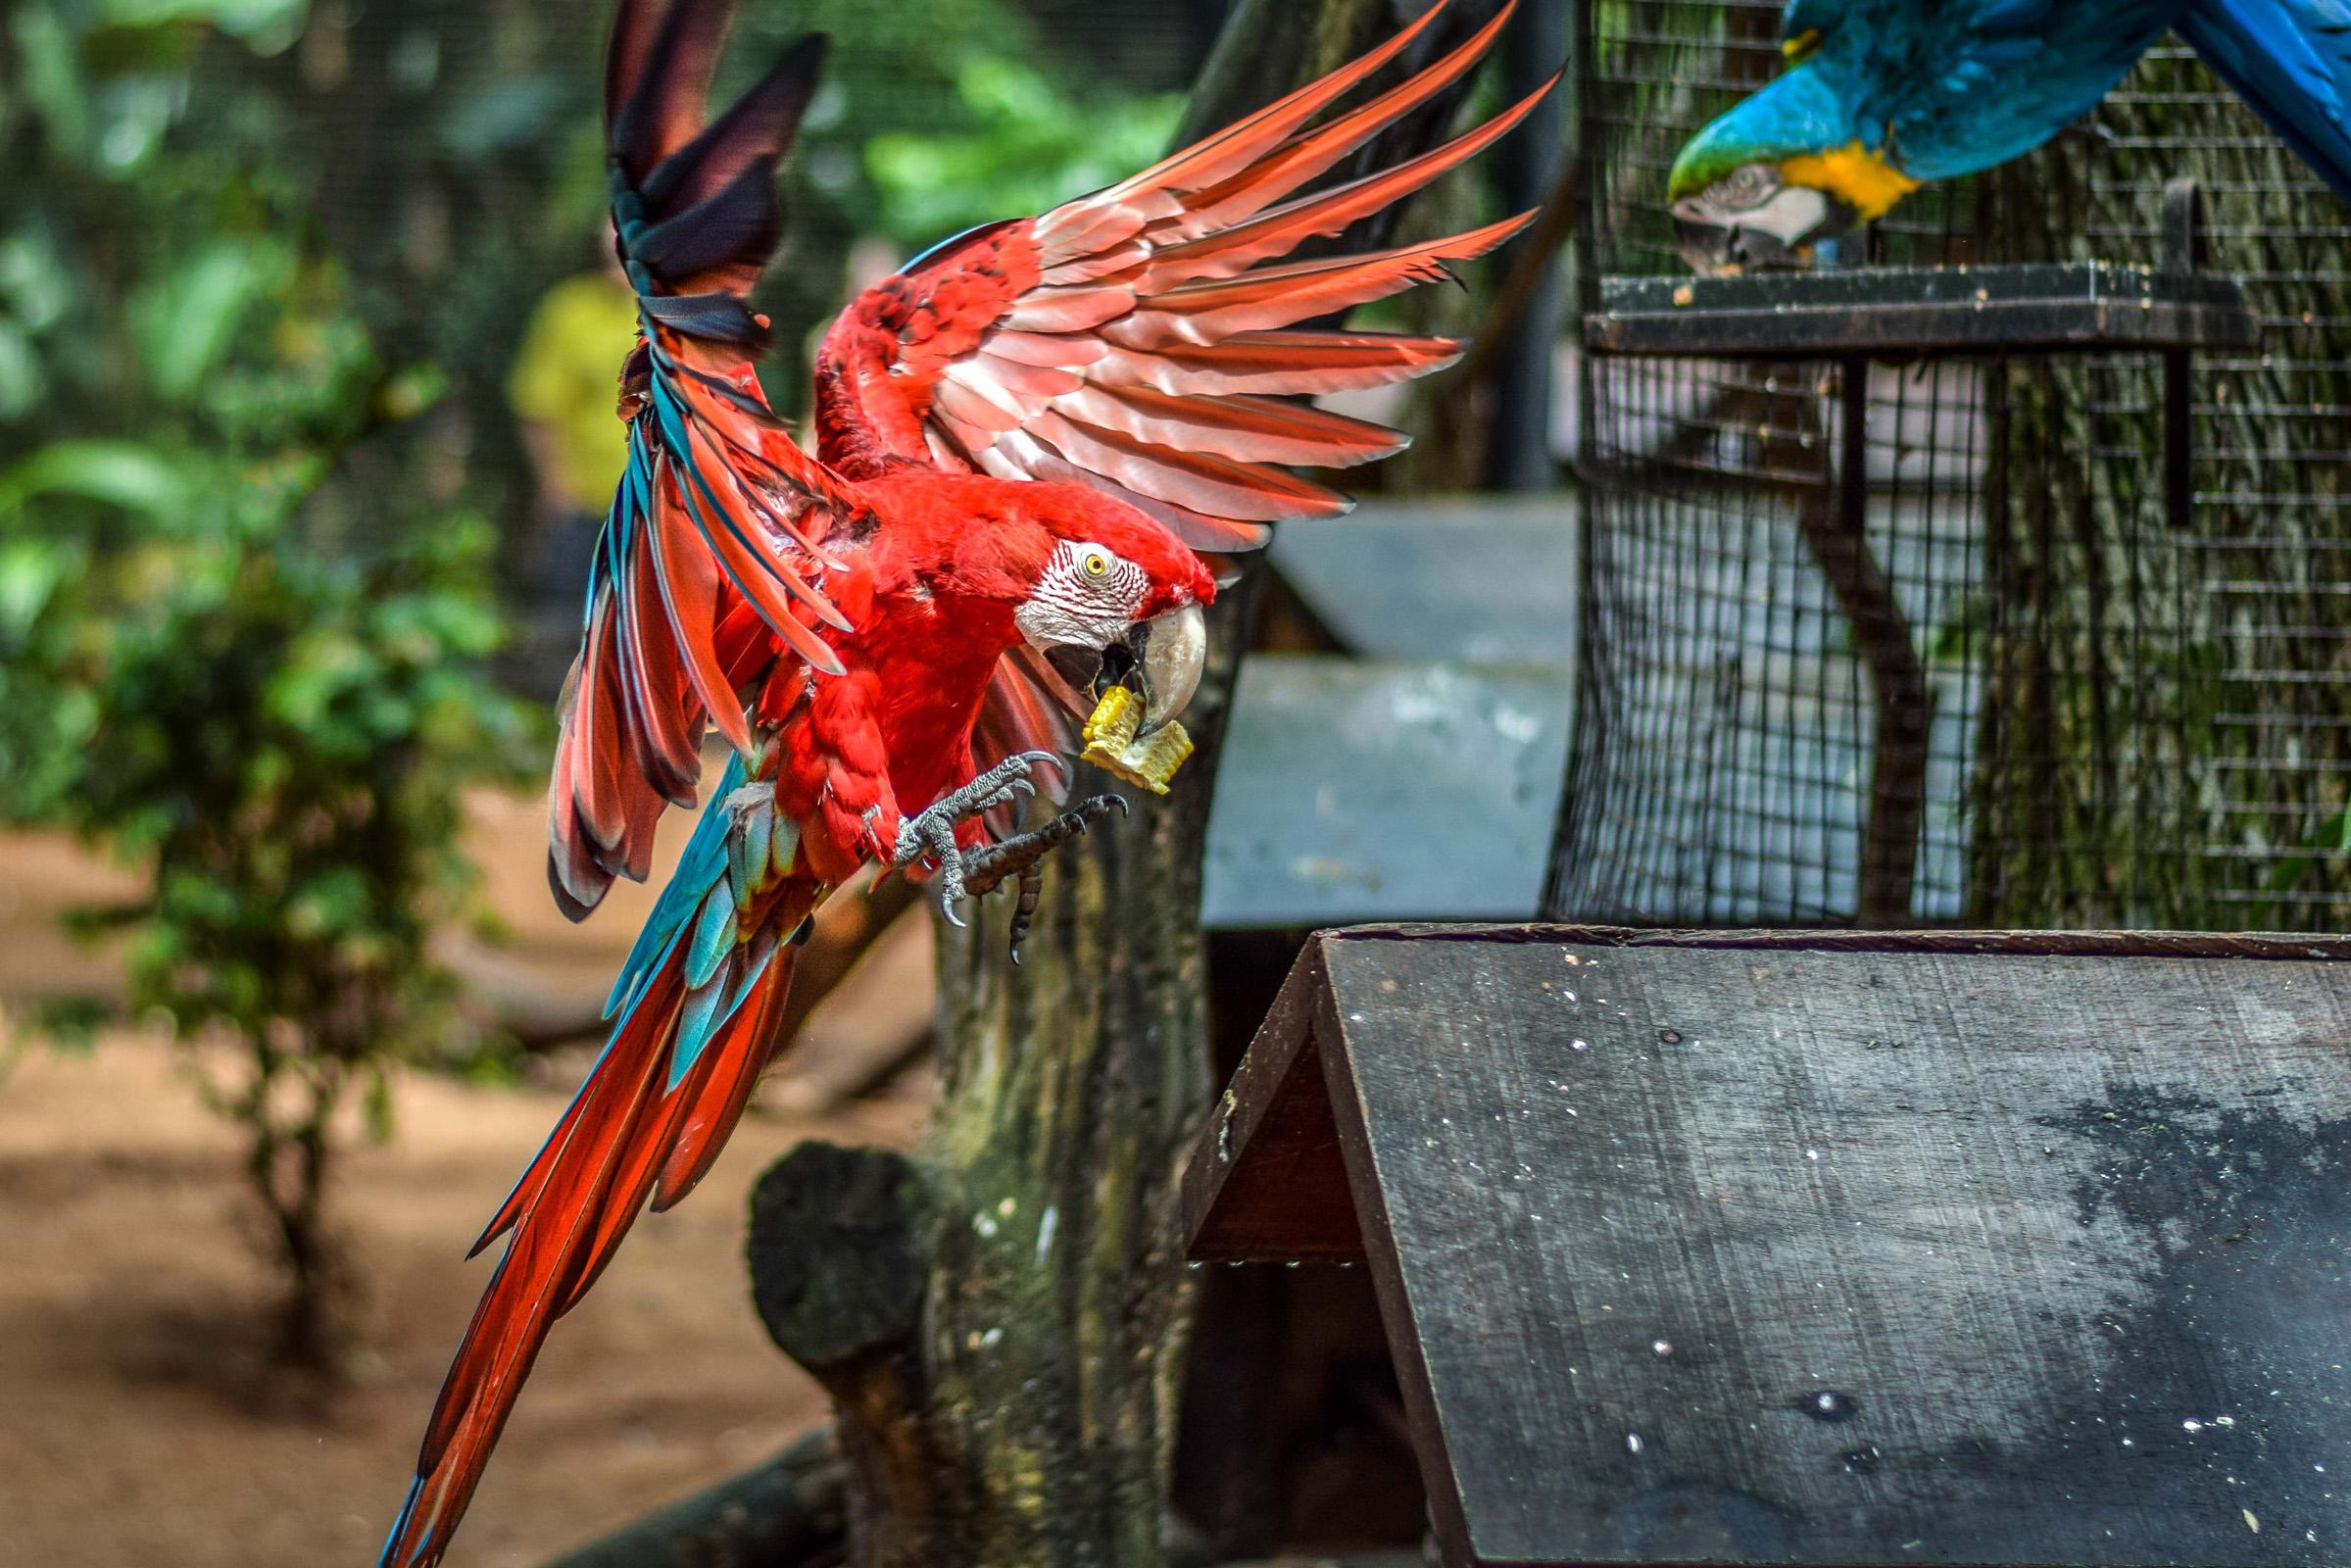 IguazuBirdPark-8.jpg